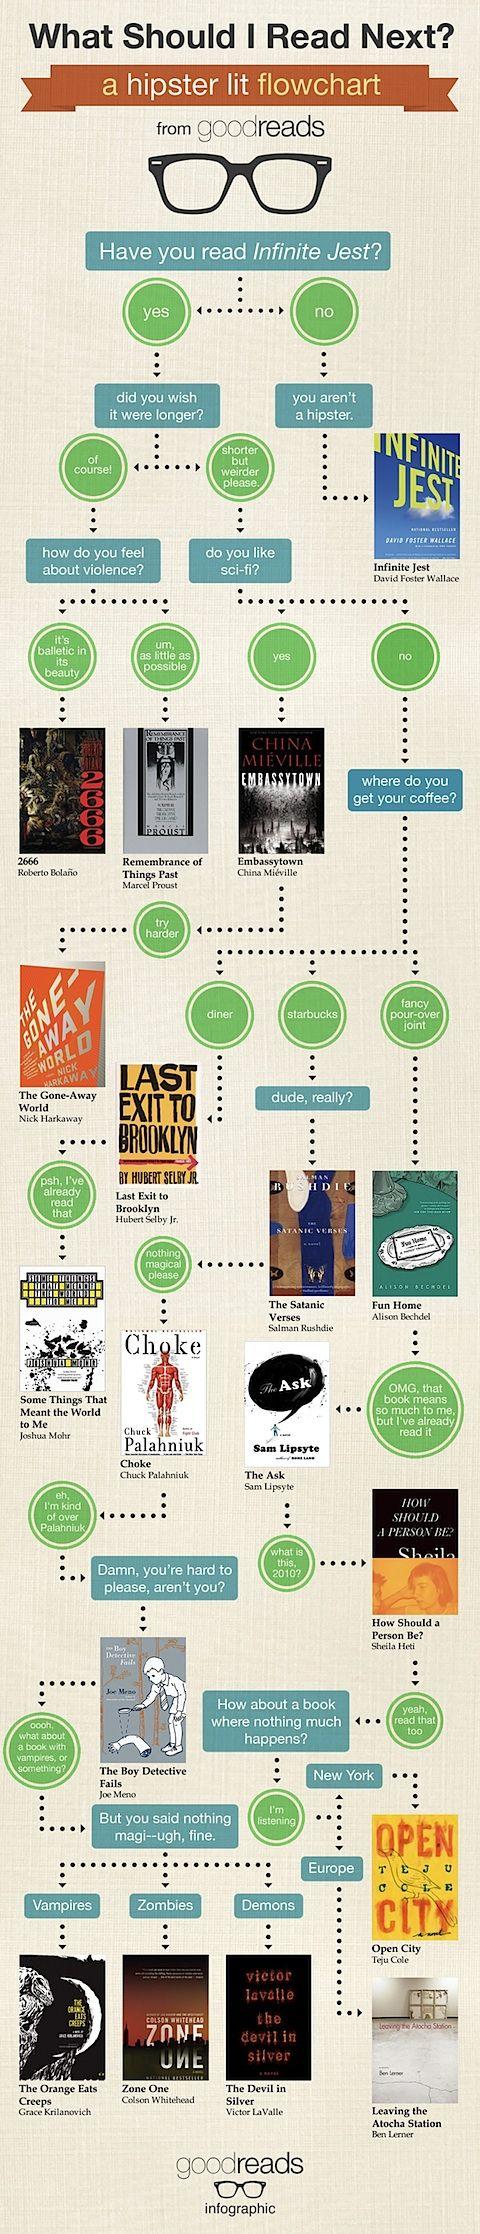 78 Best images about Flow chart on Pinterest | Short films Charts